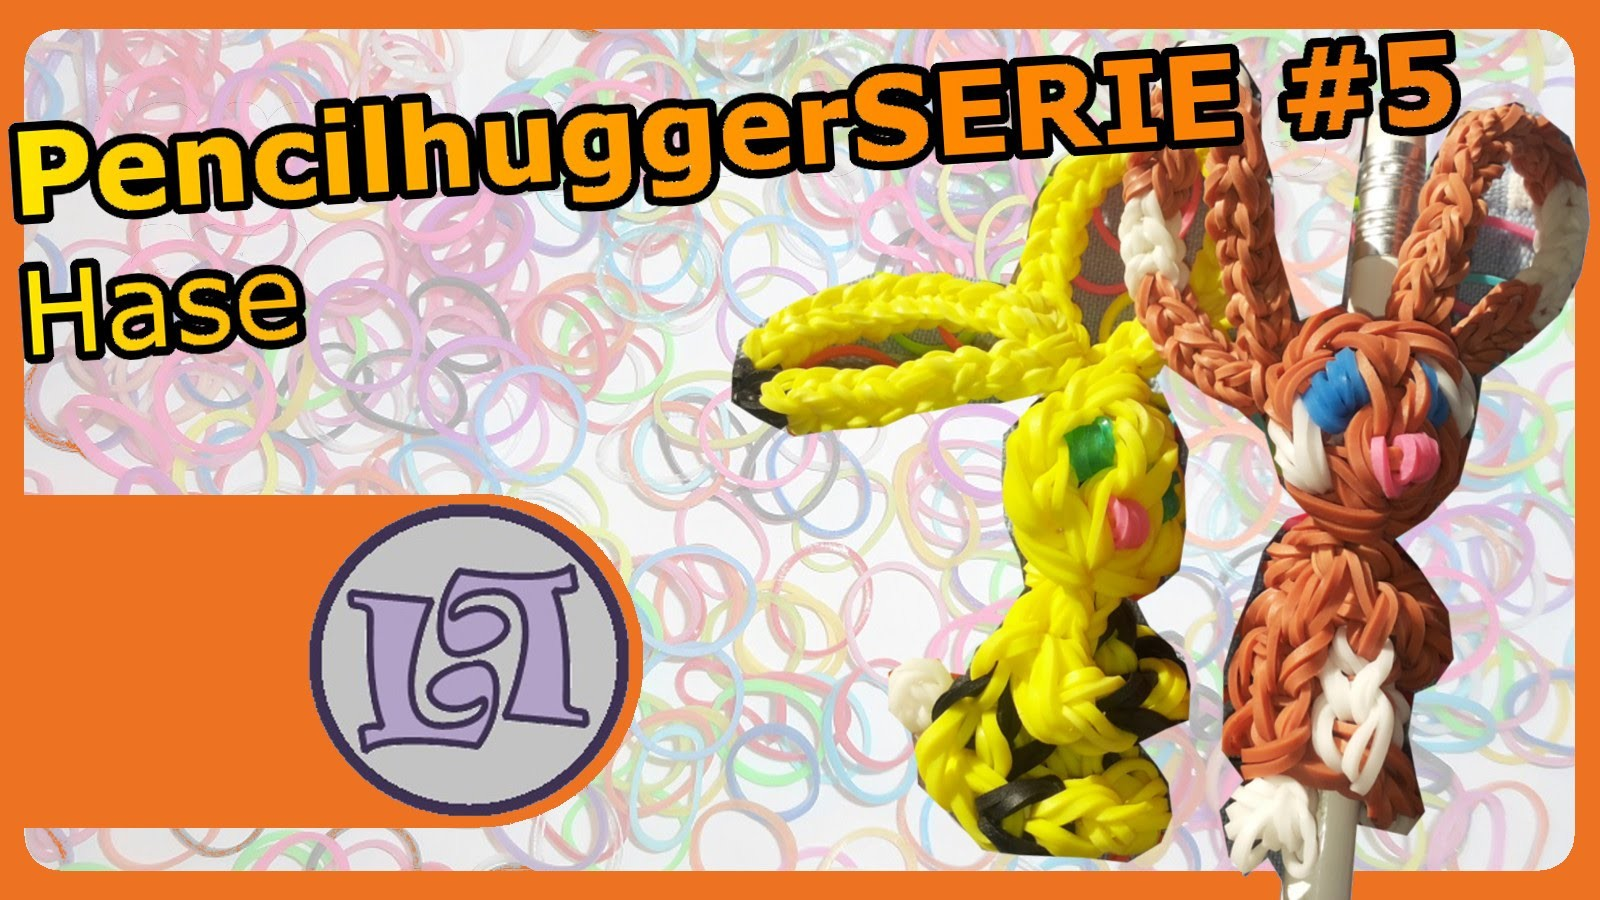 Rainbow Loom. Hase Pencilhuggerserie #5 | Luna Looms